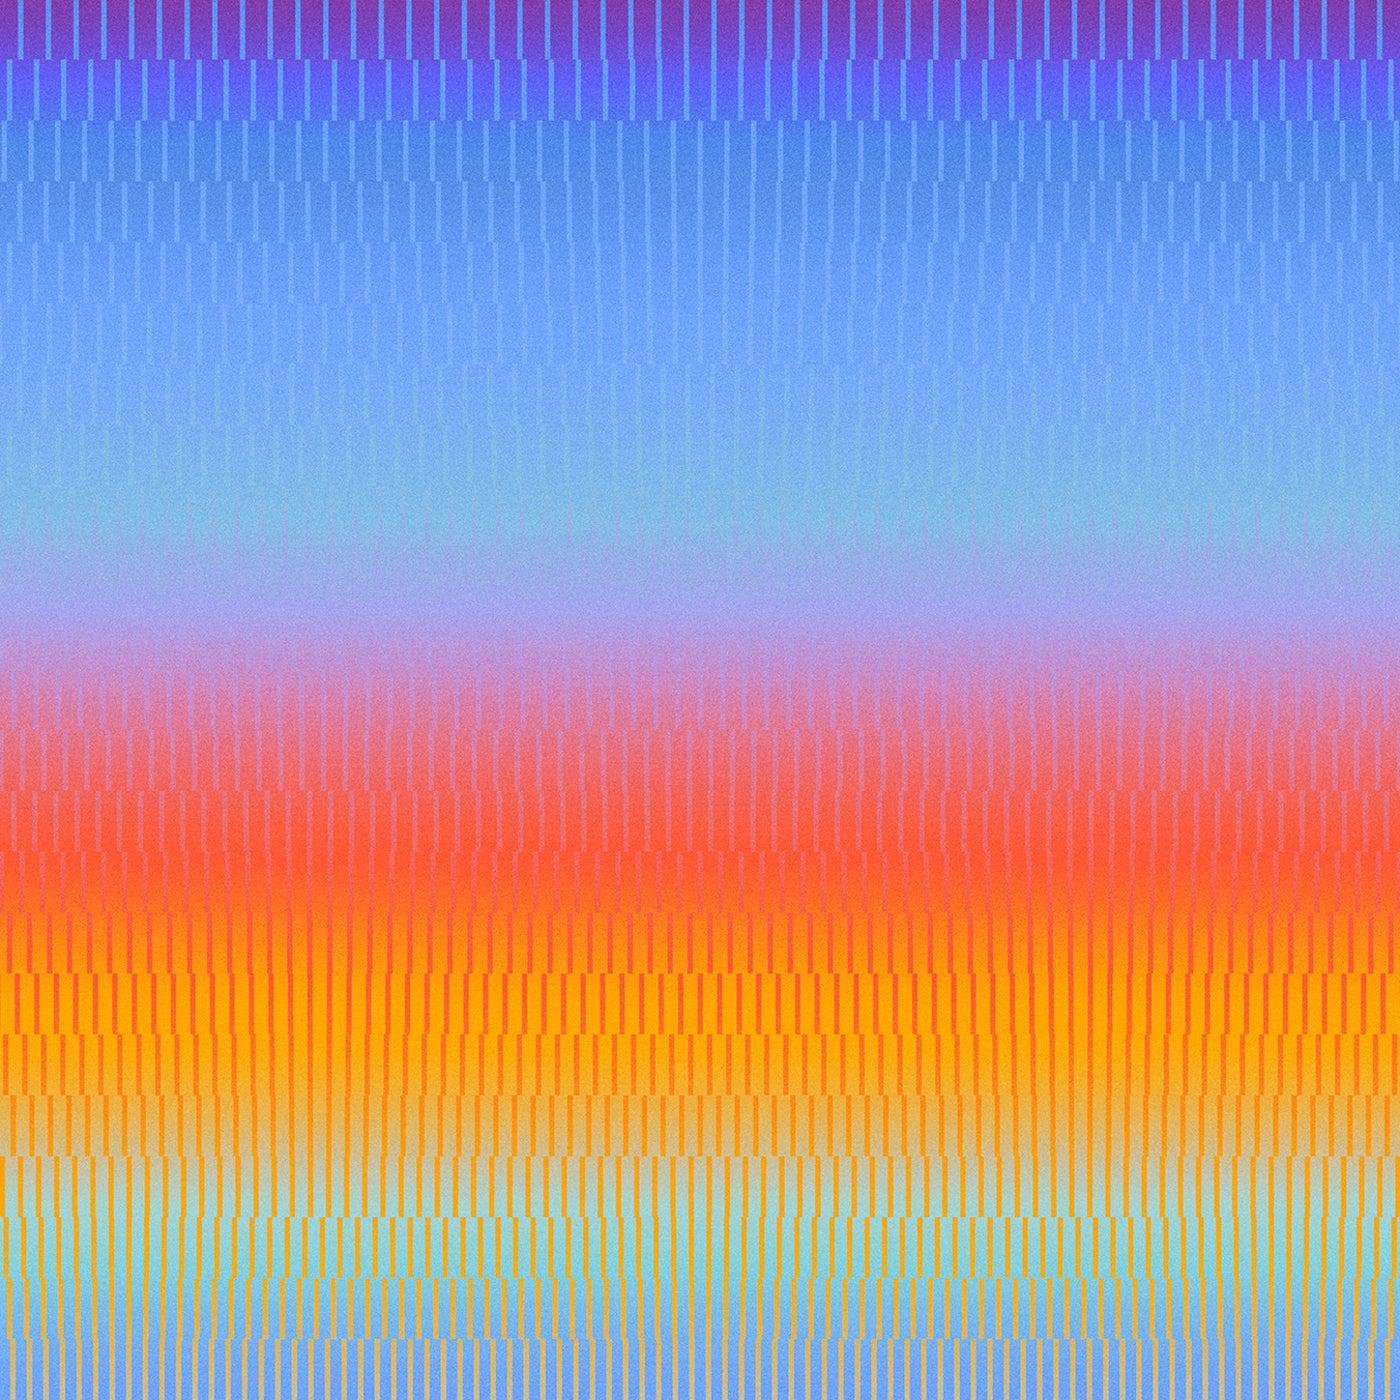 Mirrored Identities (Original Mix)